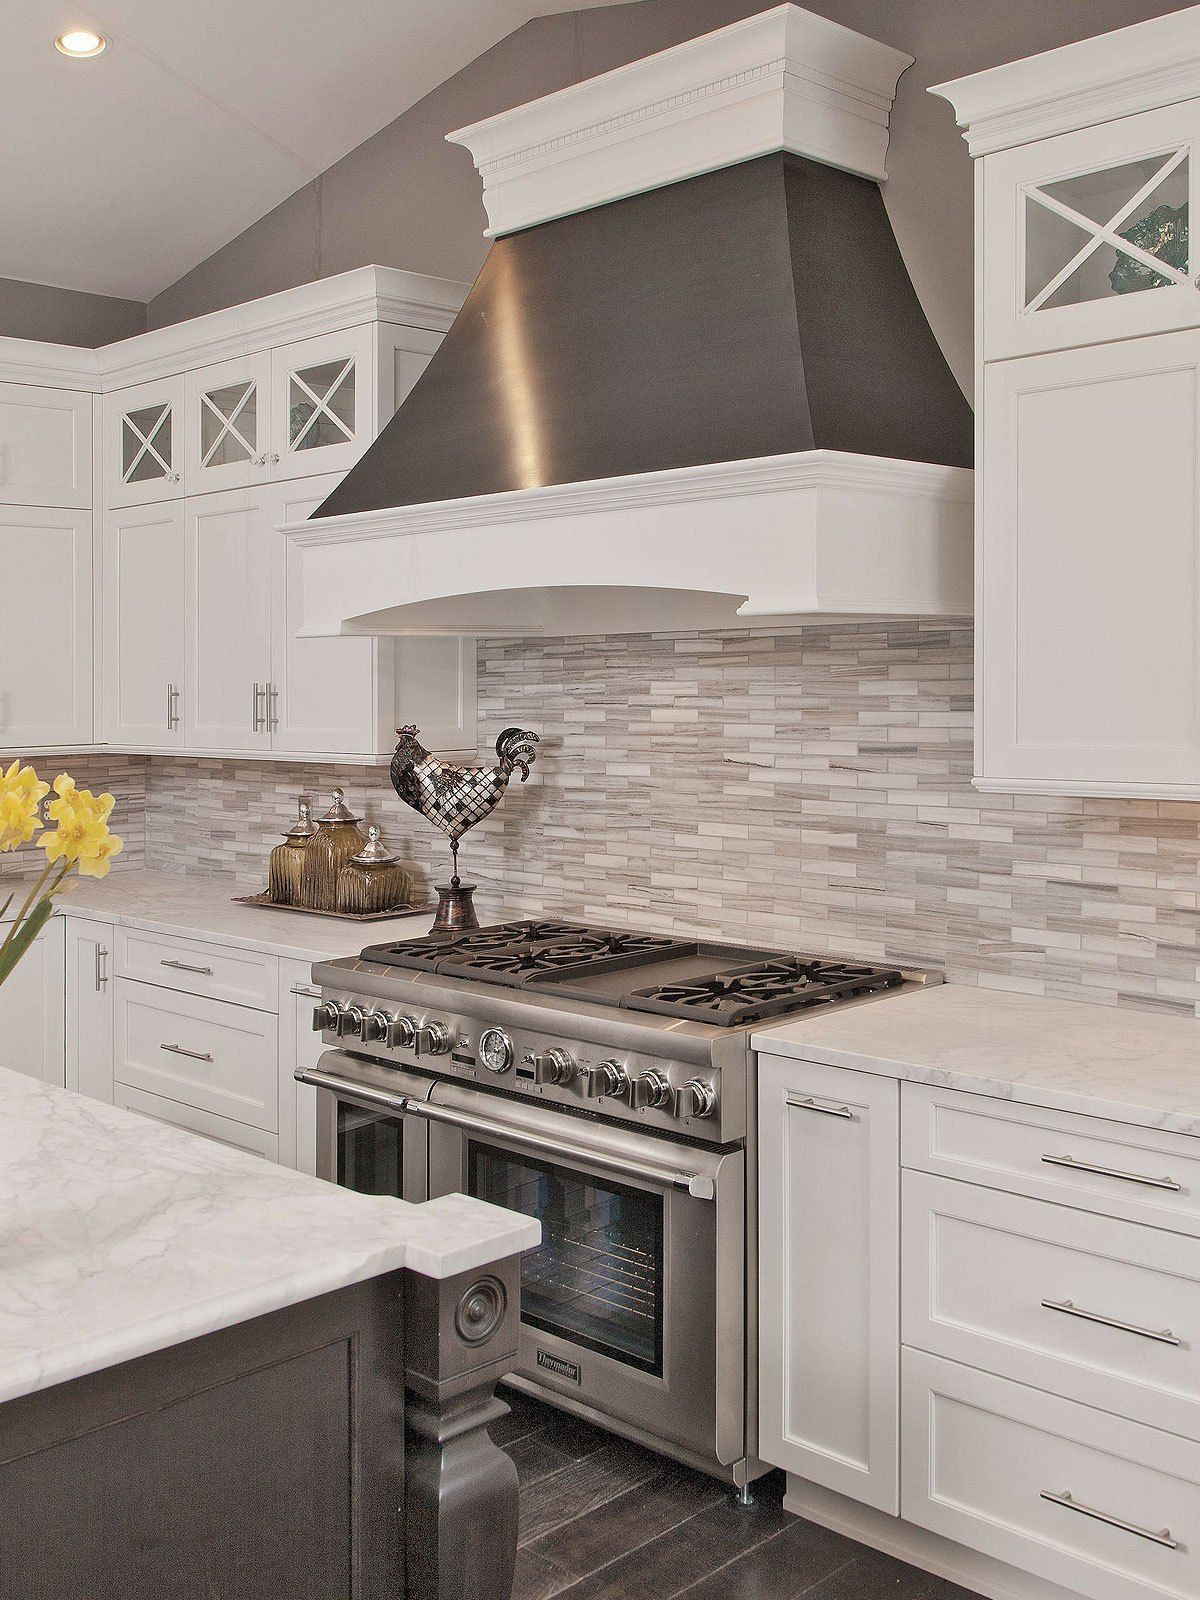 Modern White Gray Subway Marble Backsplash Tile Kitchen Remodel